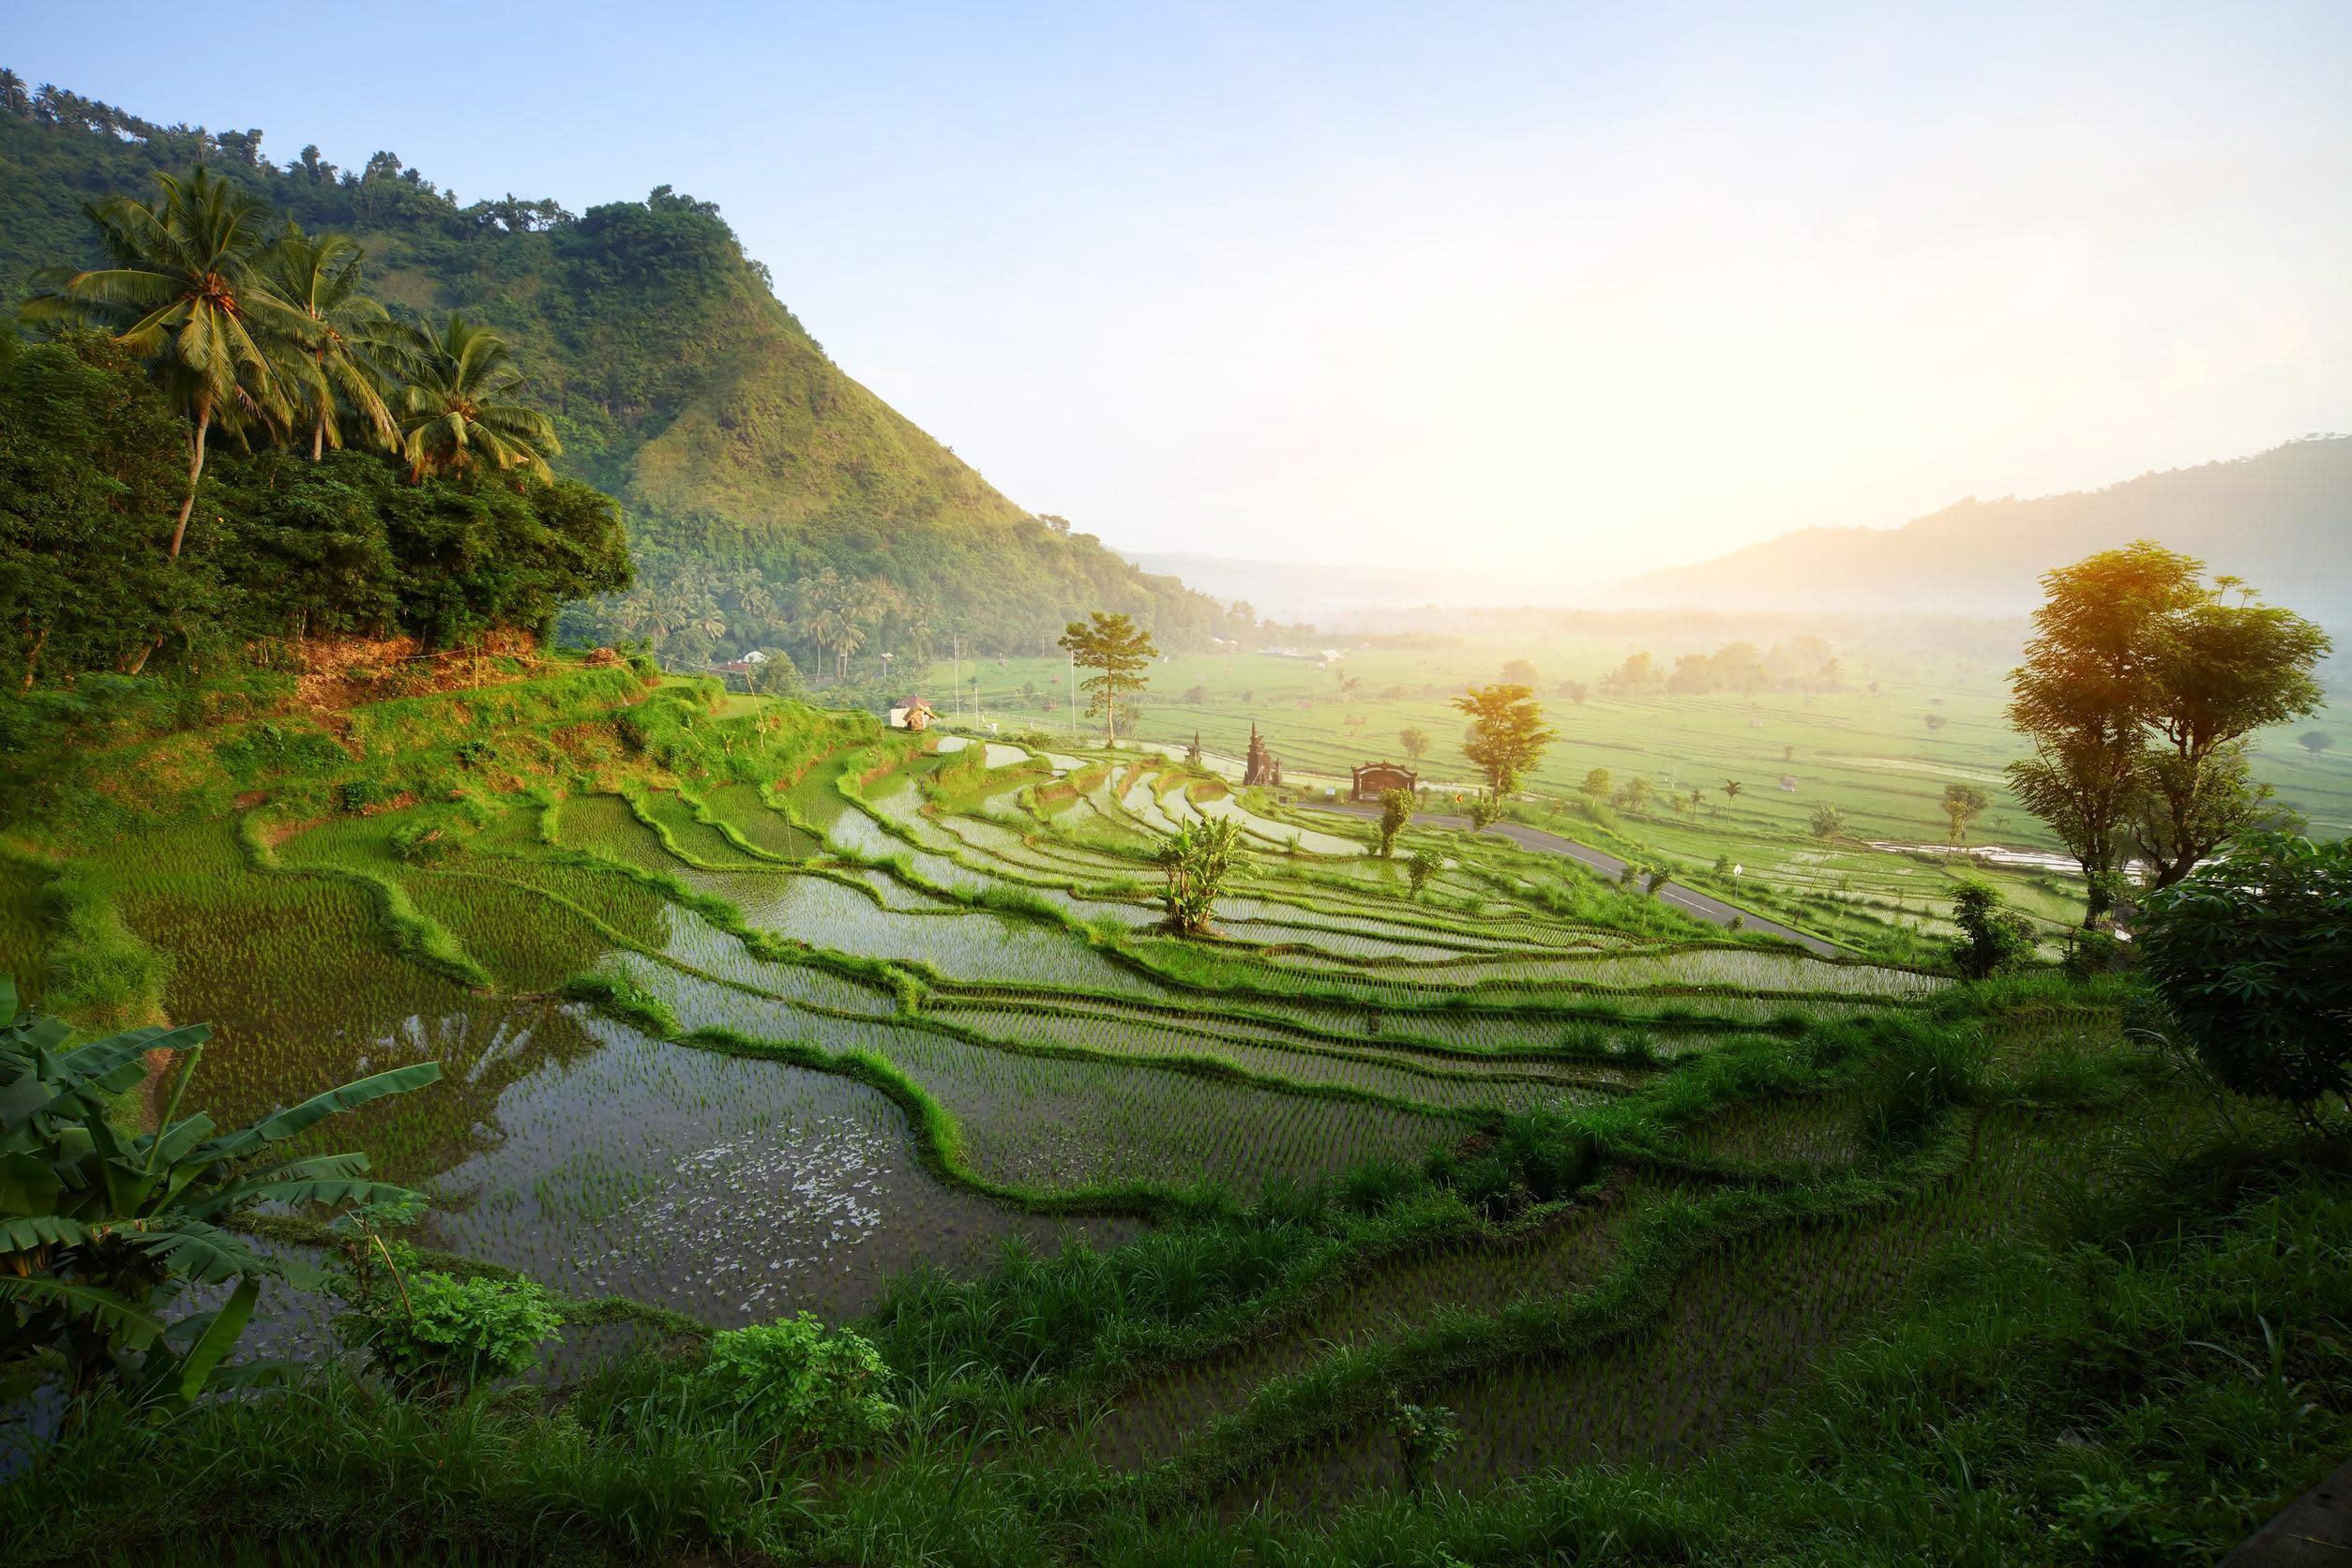 Indonesien Rundreise Wetter